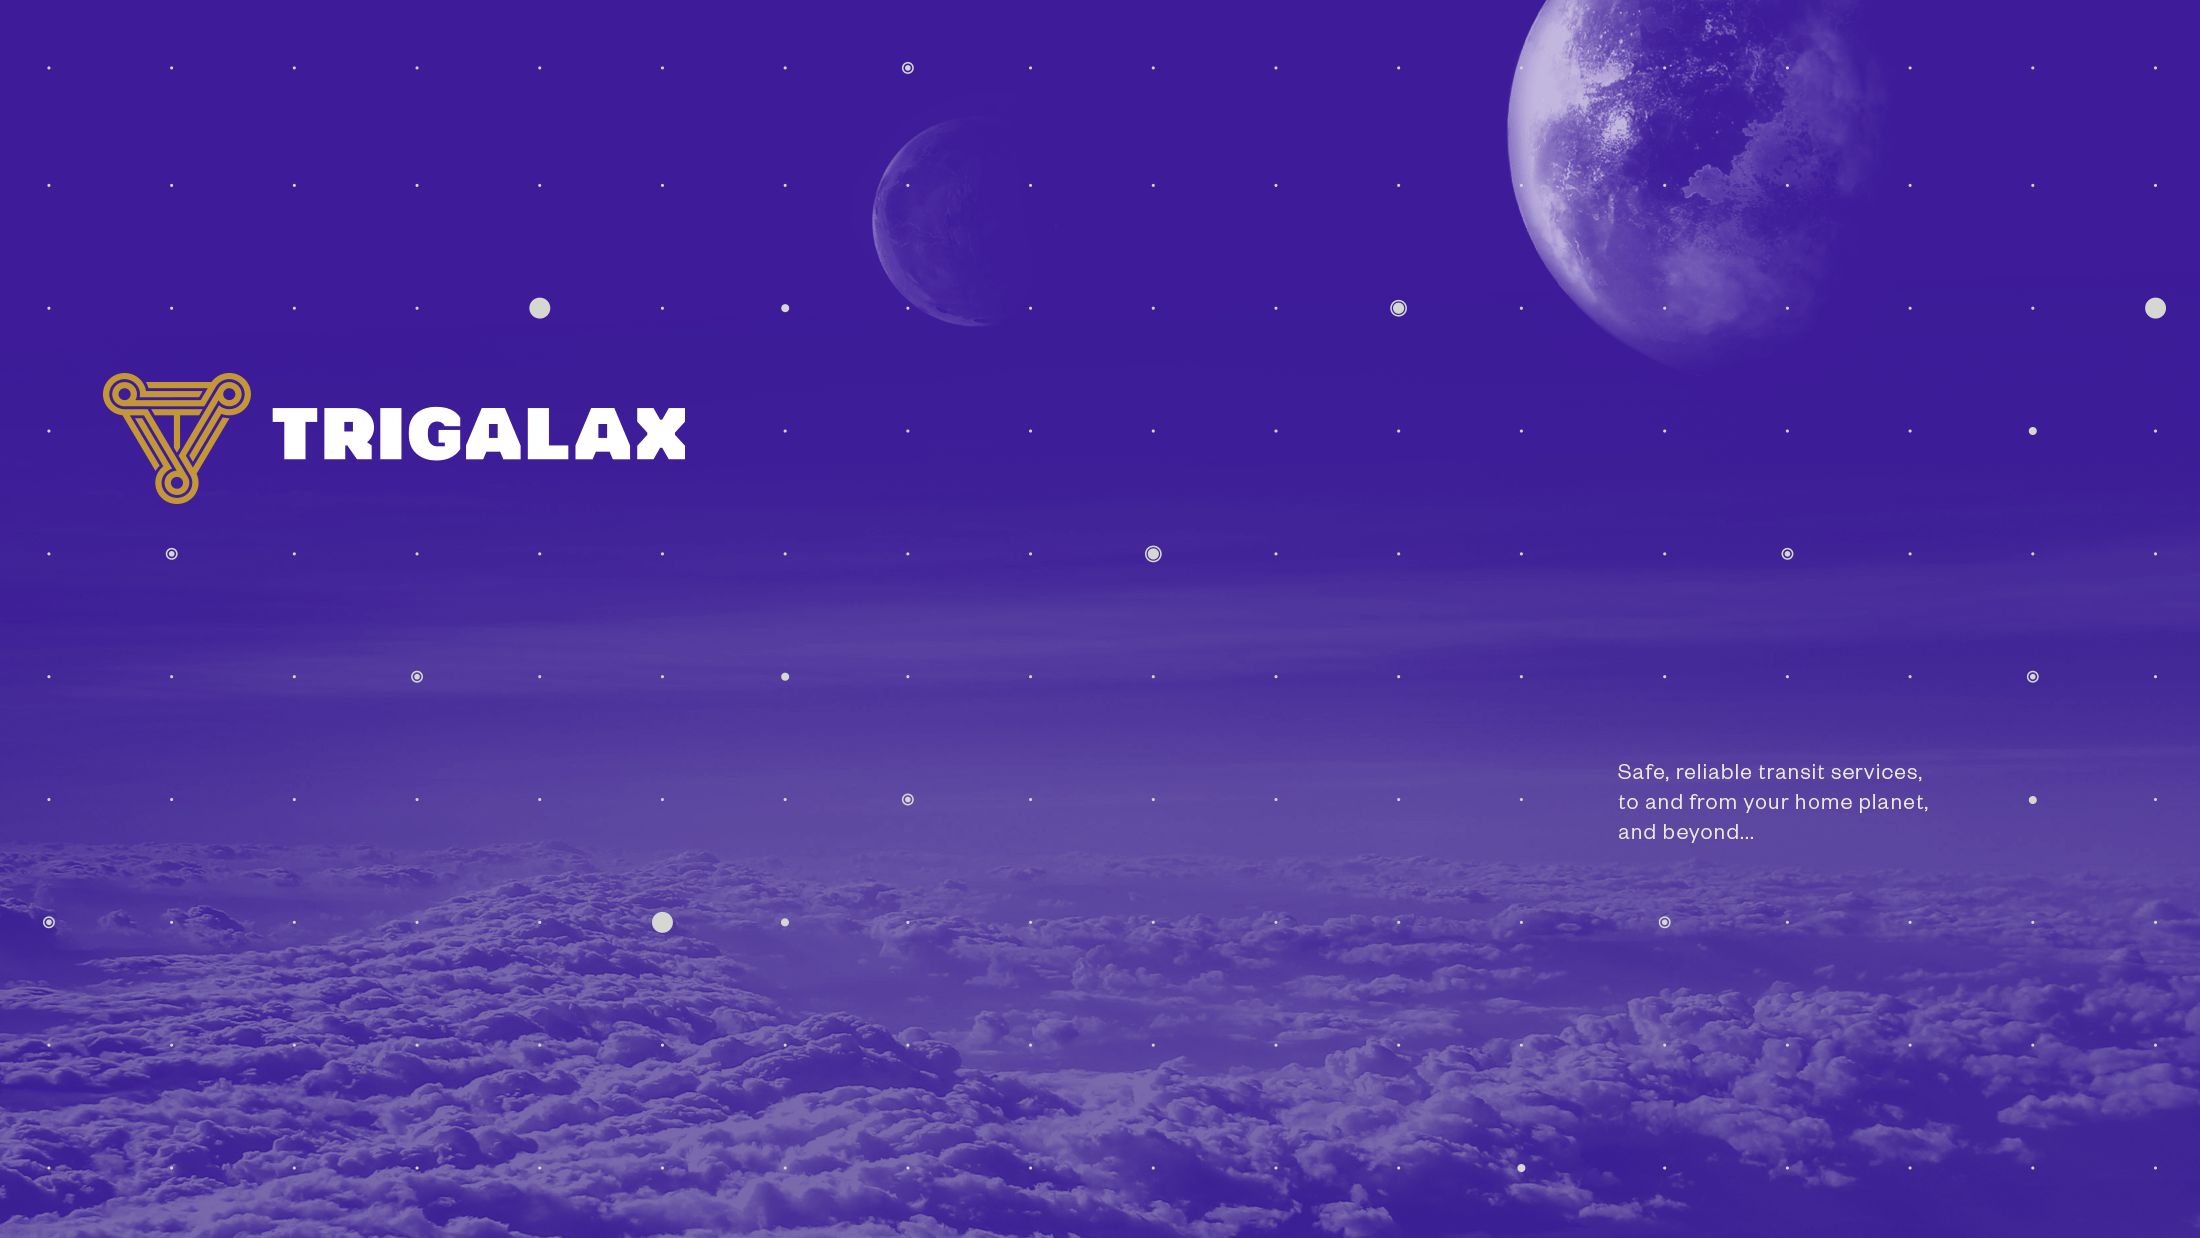 00_Trigalax-Space-Branding-logo